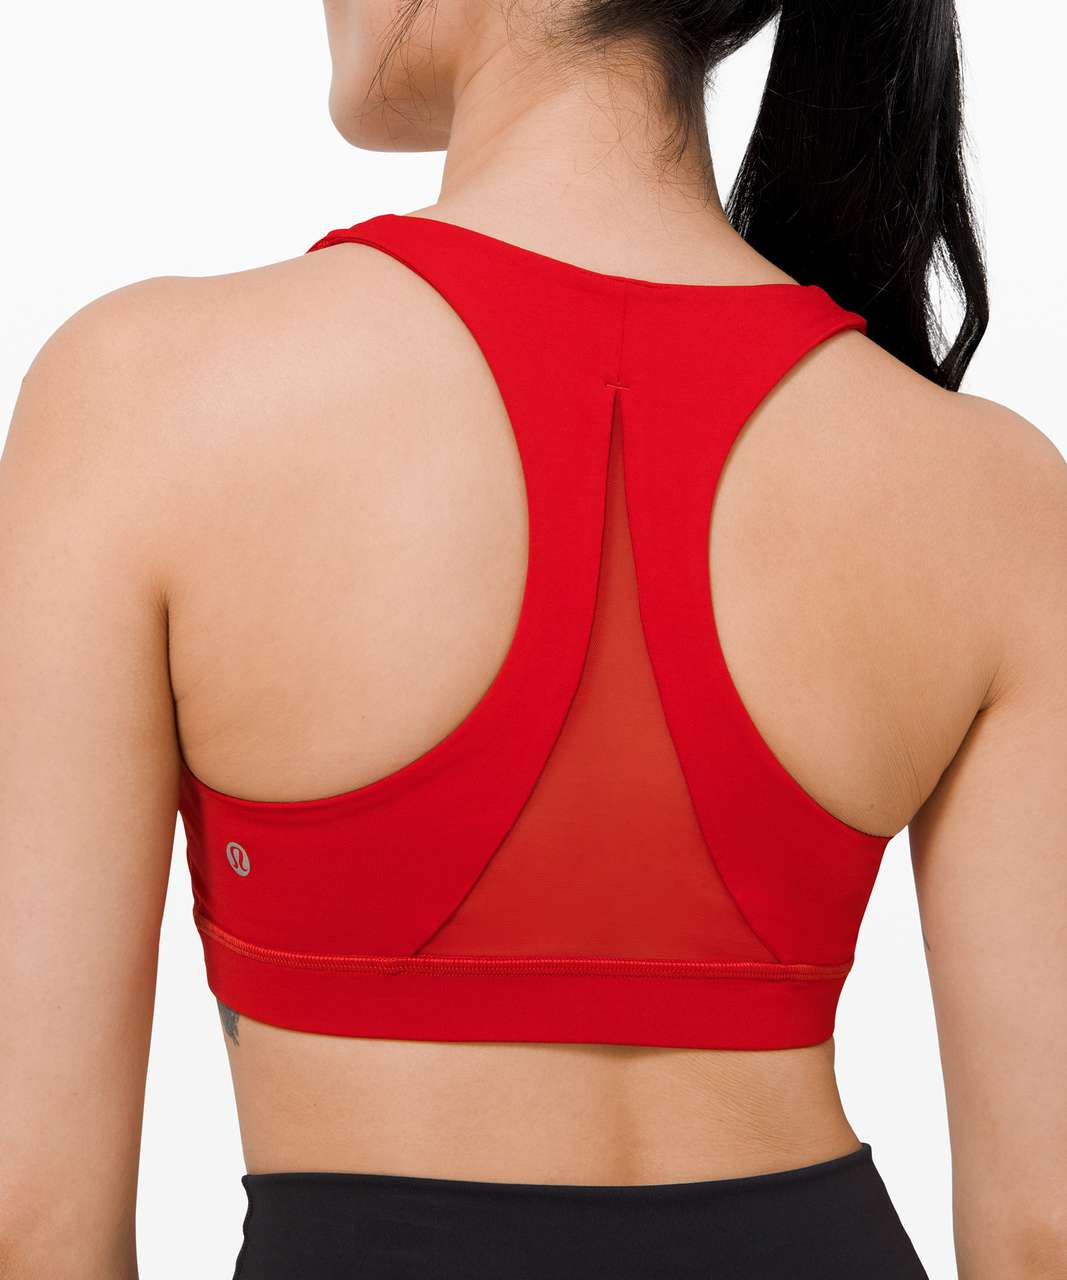 Lululemon Invigorate Bra *Medium Support, B/C Cup - Dark Red